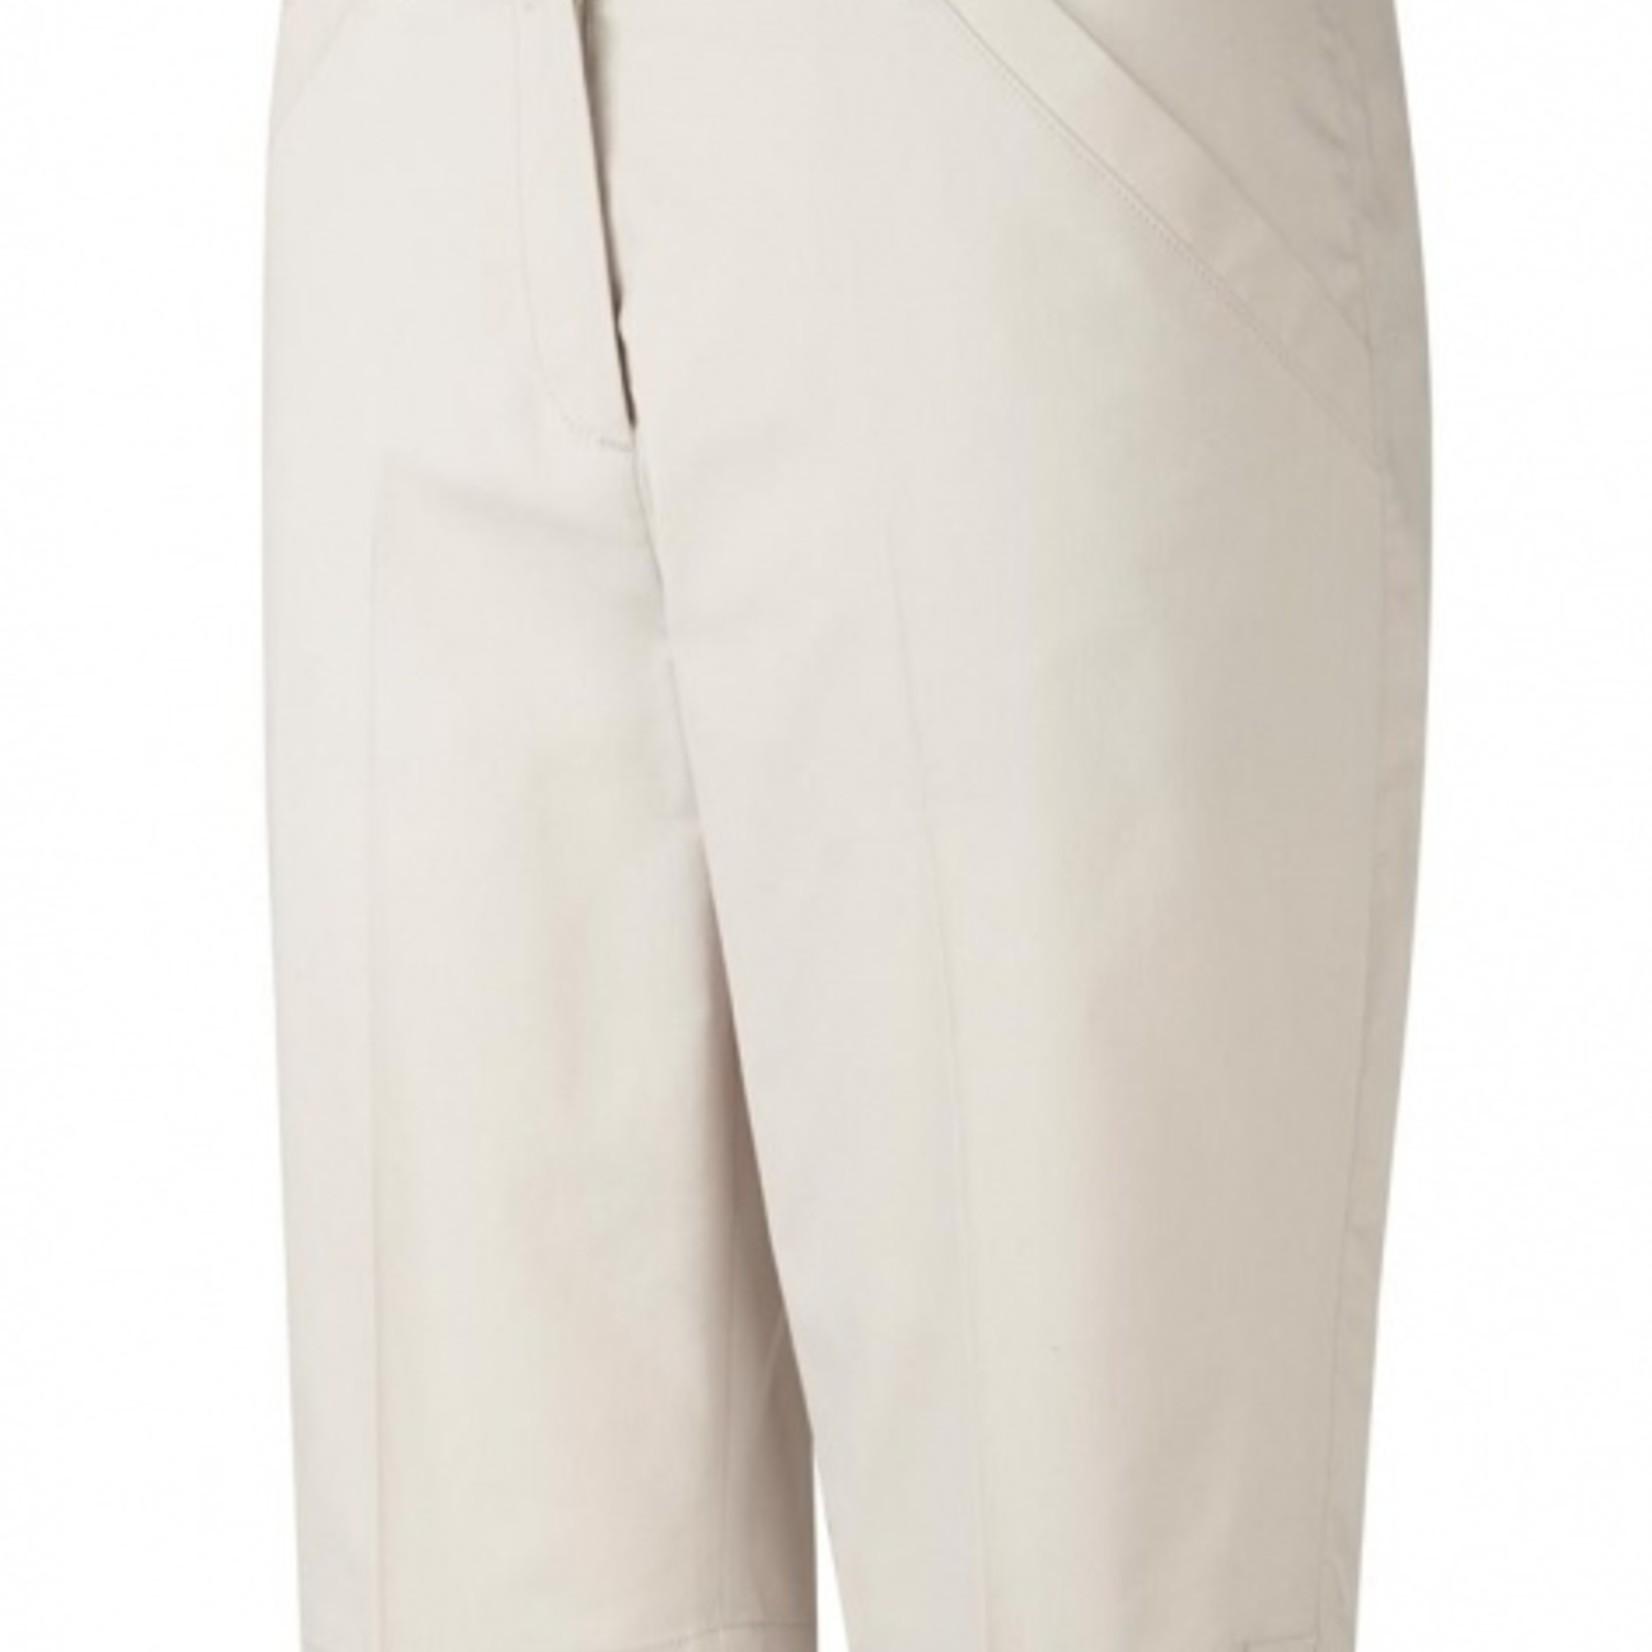 "Ping Ping Ladies Clothing Smpl Short 17"""